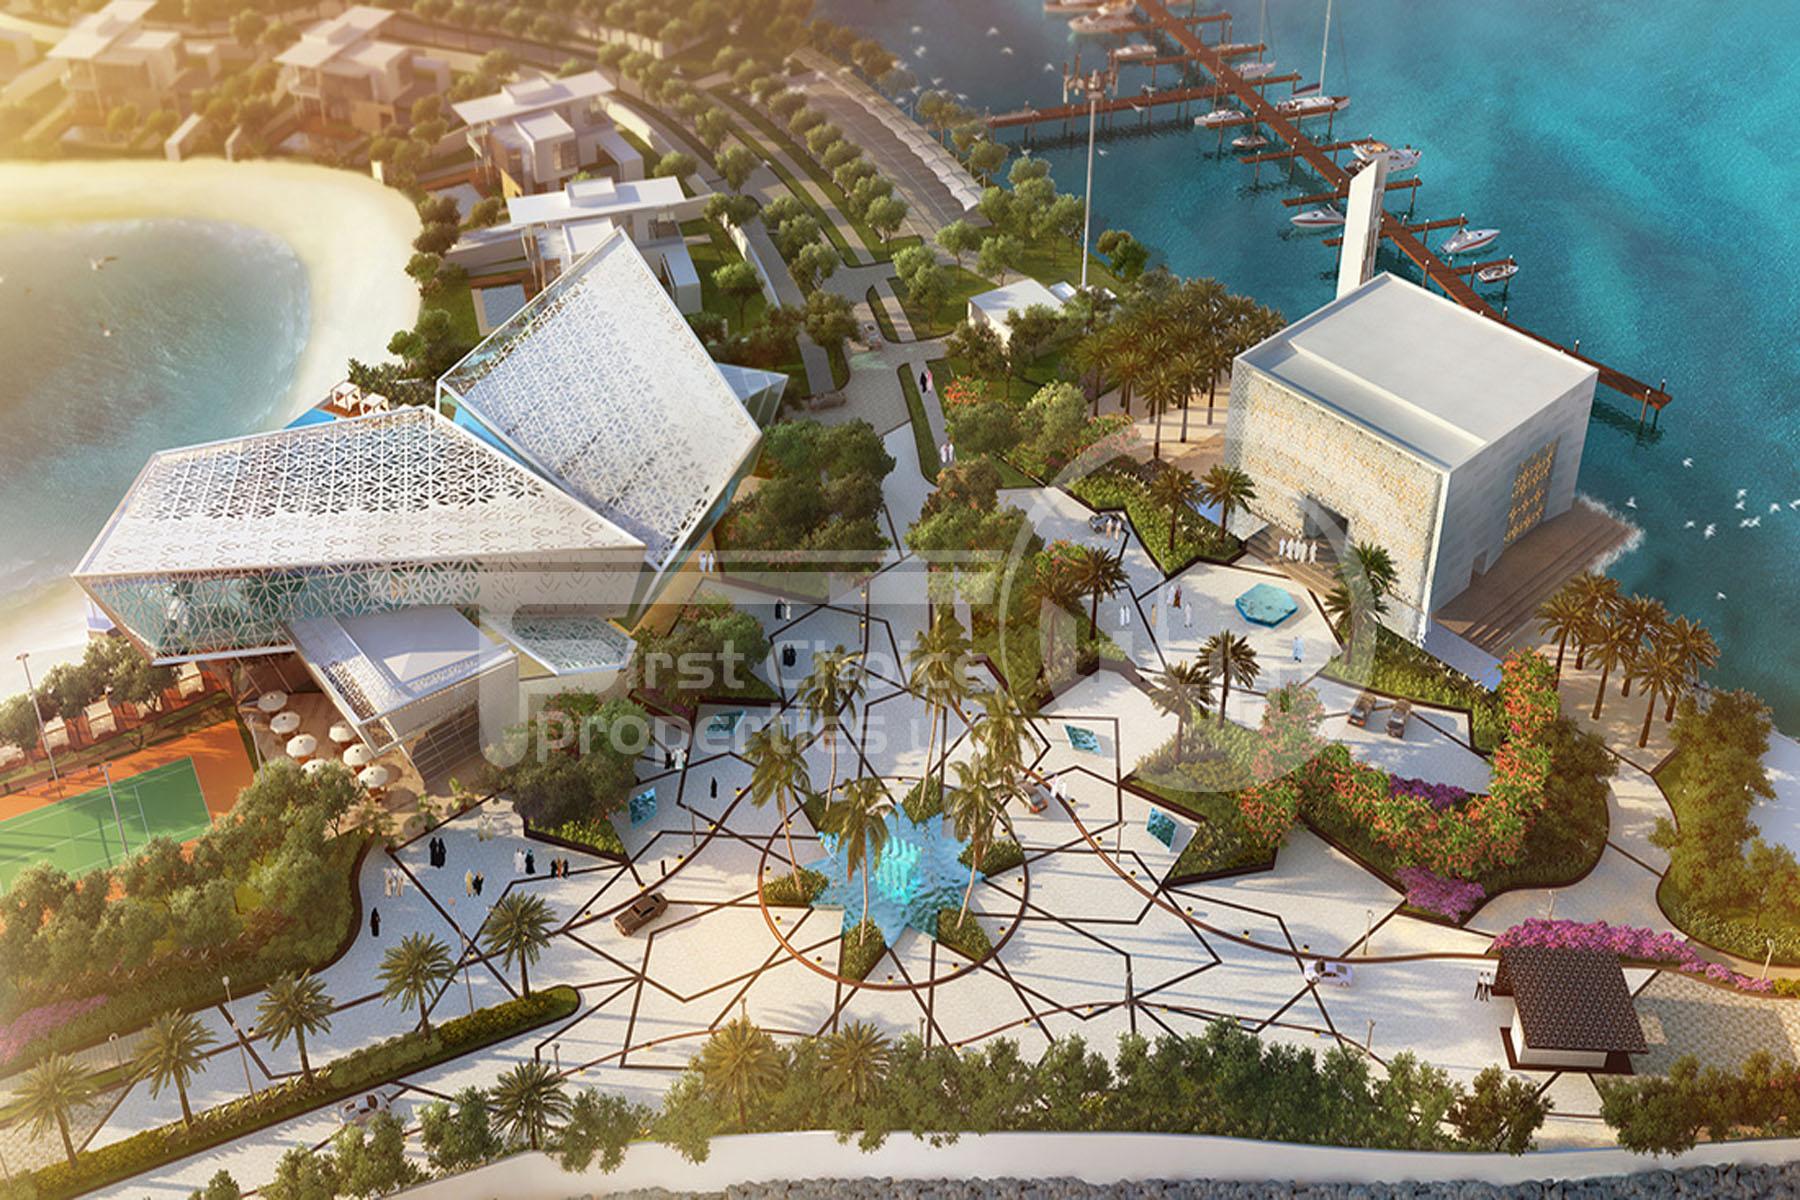 Residential Island - Nareel Island - Al Bateen - Abu Dhabi - UAE (2).jpg